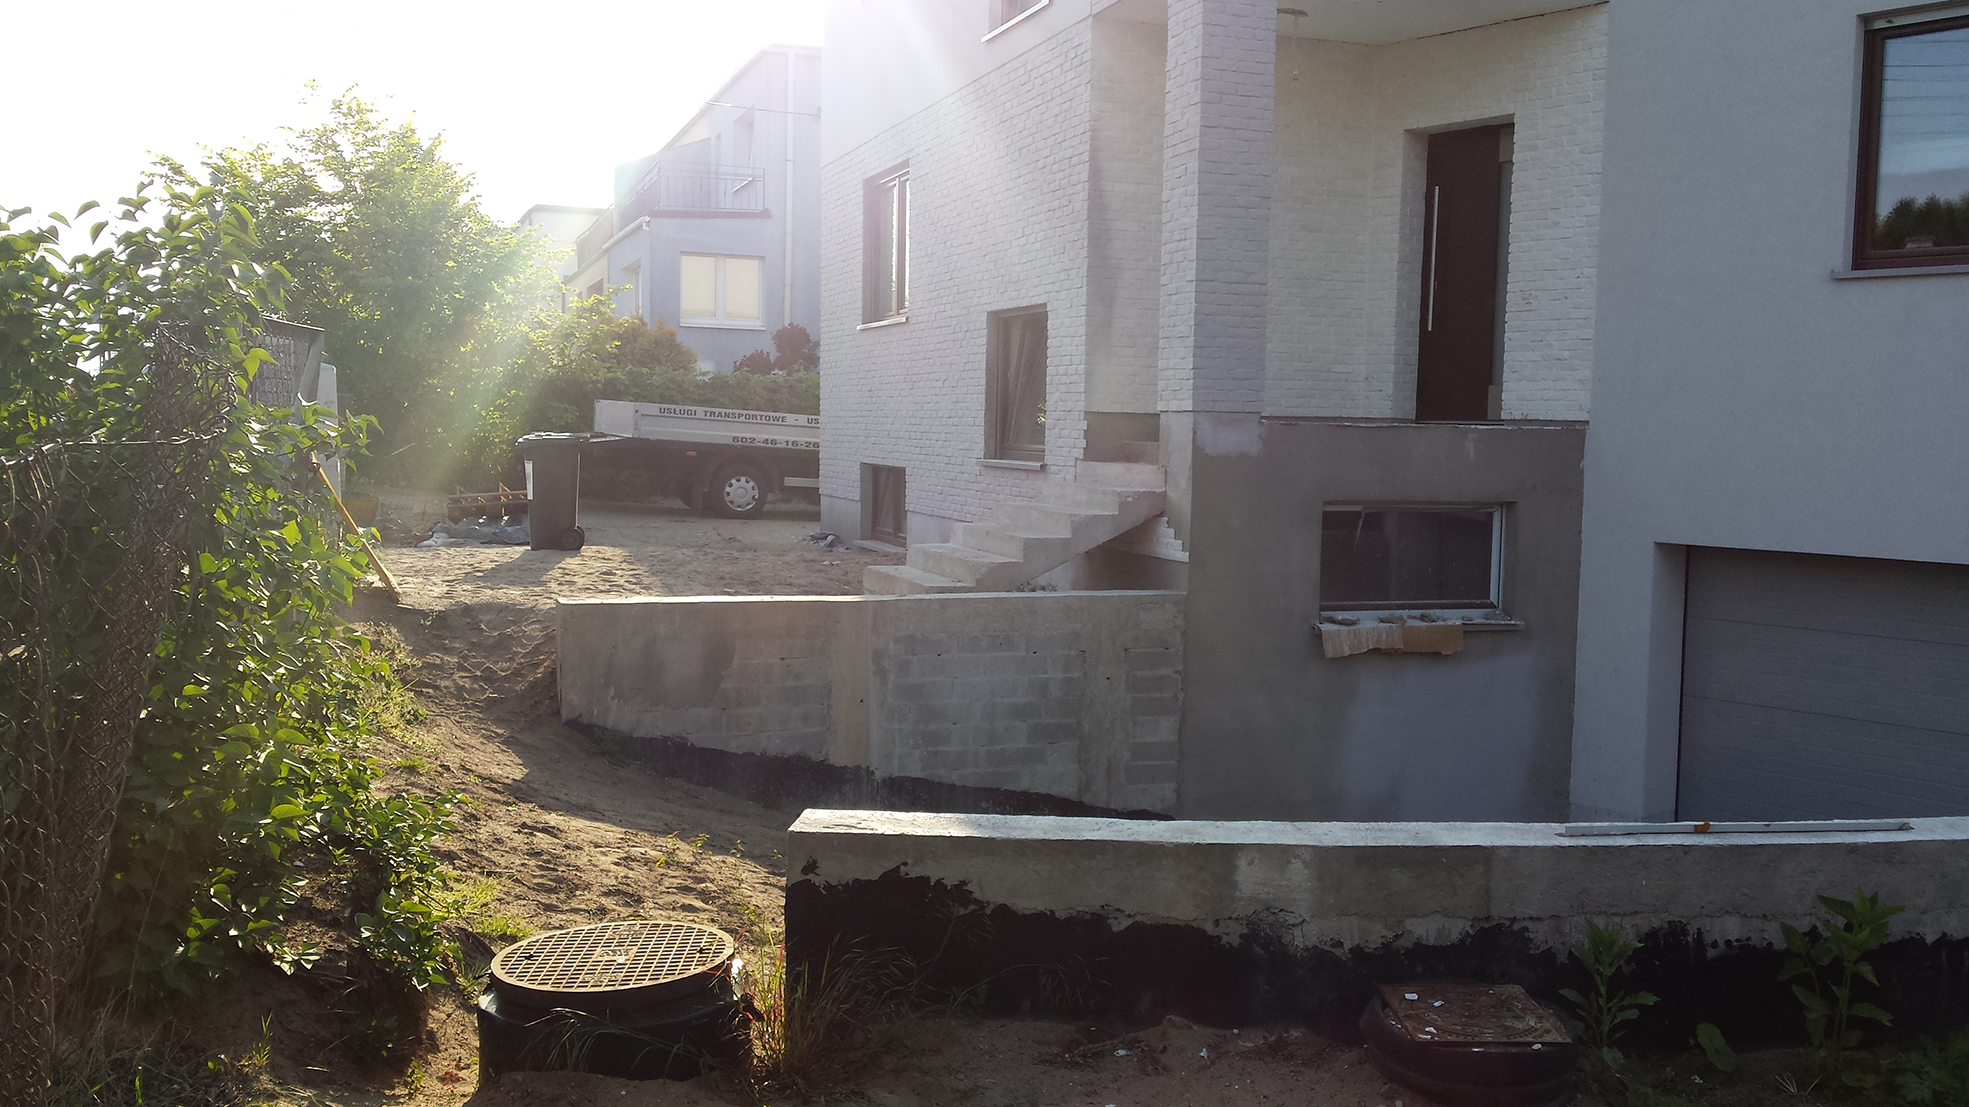 zahrada-projekt-navhrzahrady-modernazahrada-rockandflowerstudio-praha-puvodnistav